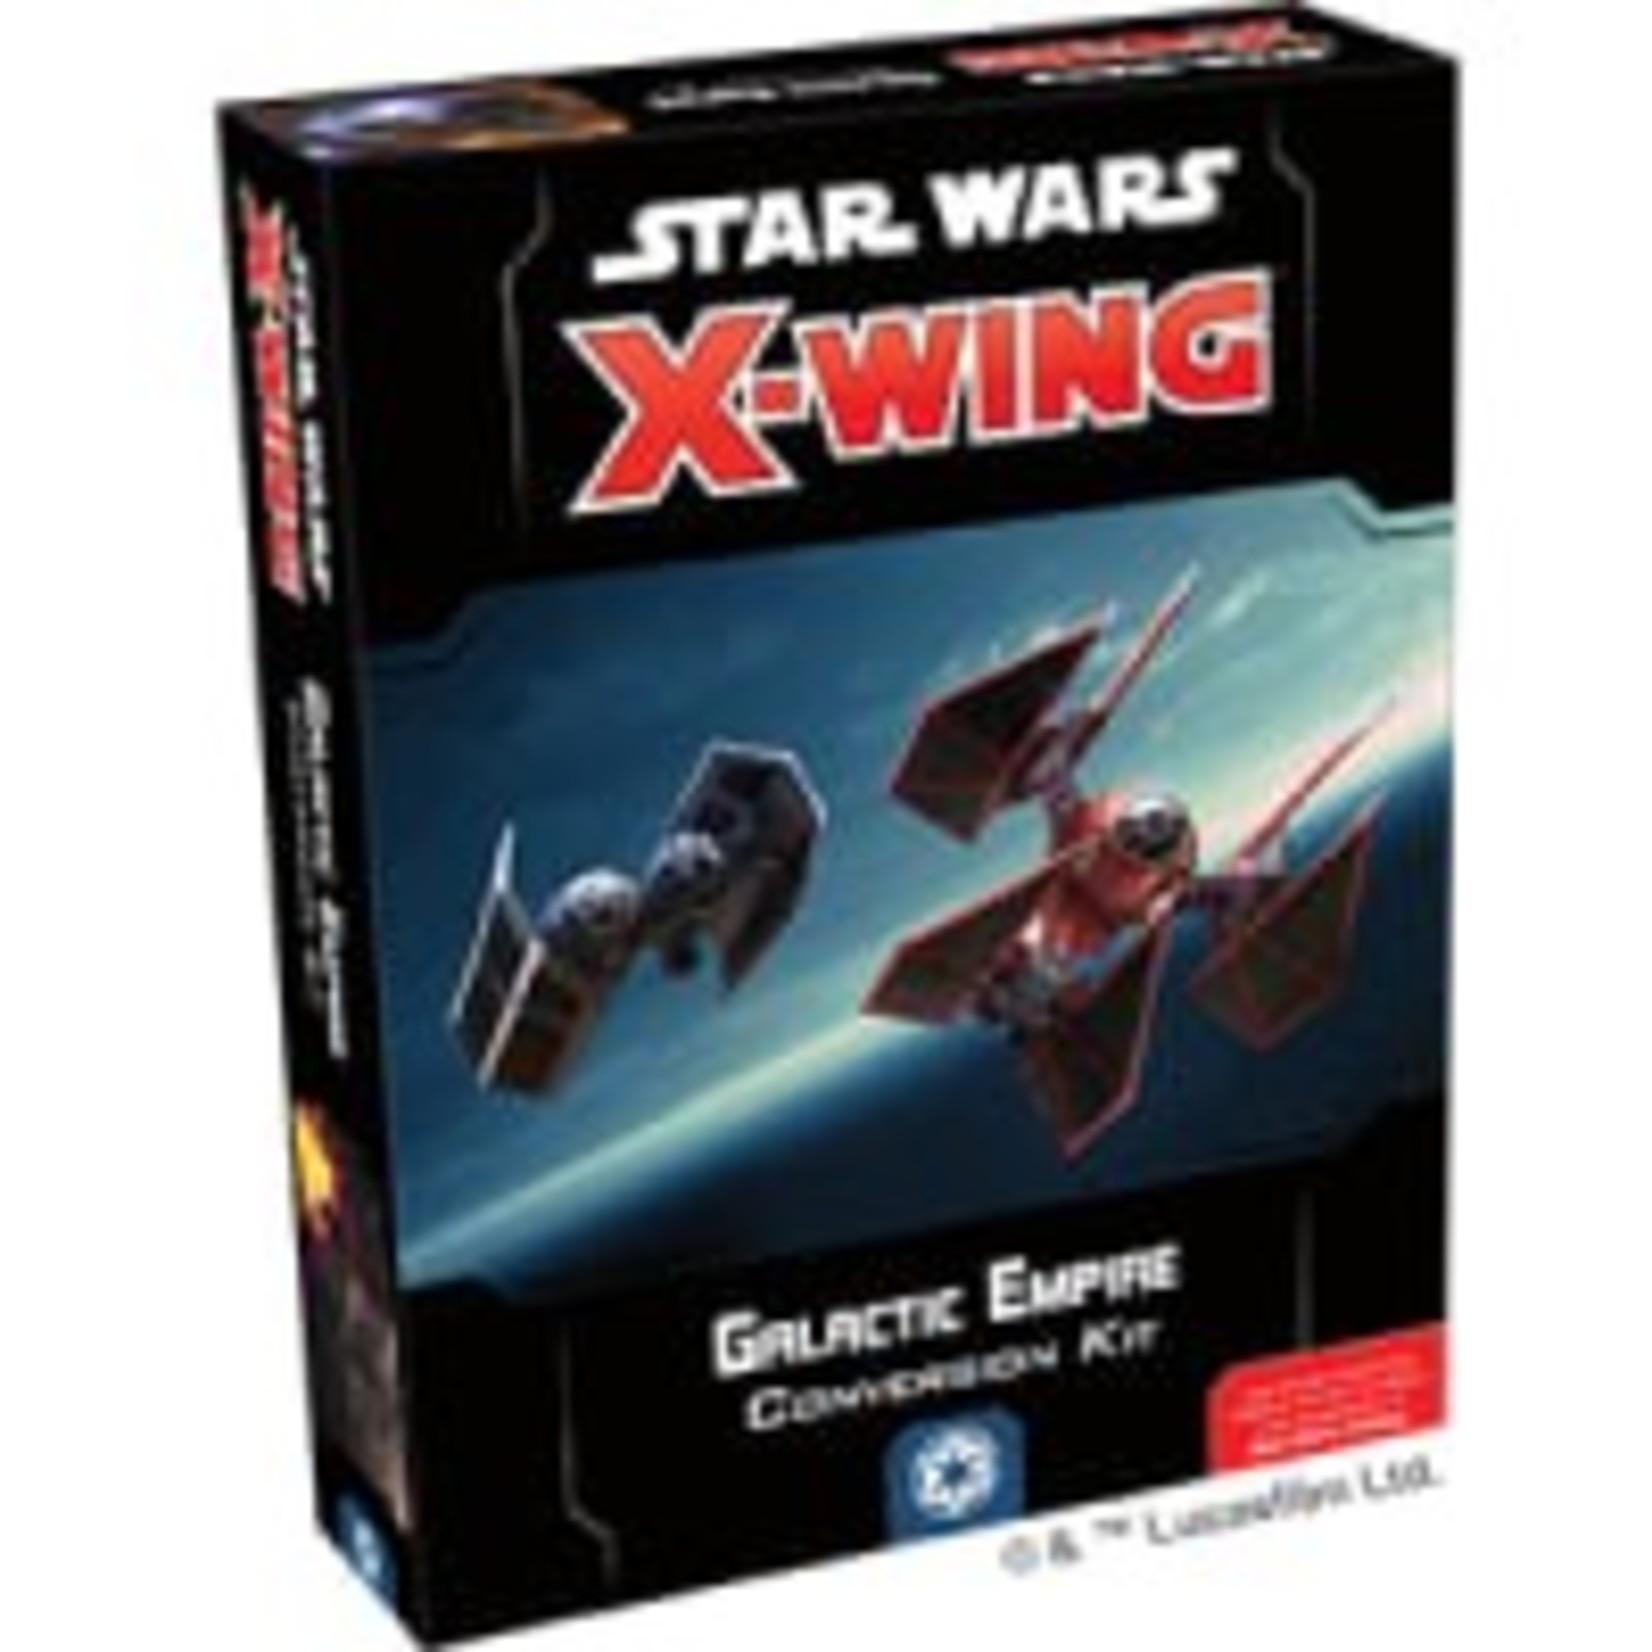 Fantasy Flight Games Star Wars X-Wing 2nd Edition: Galactic Empire Conversion Kit